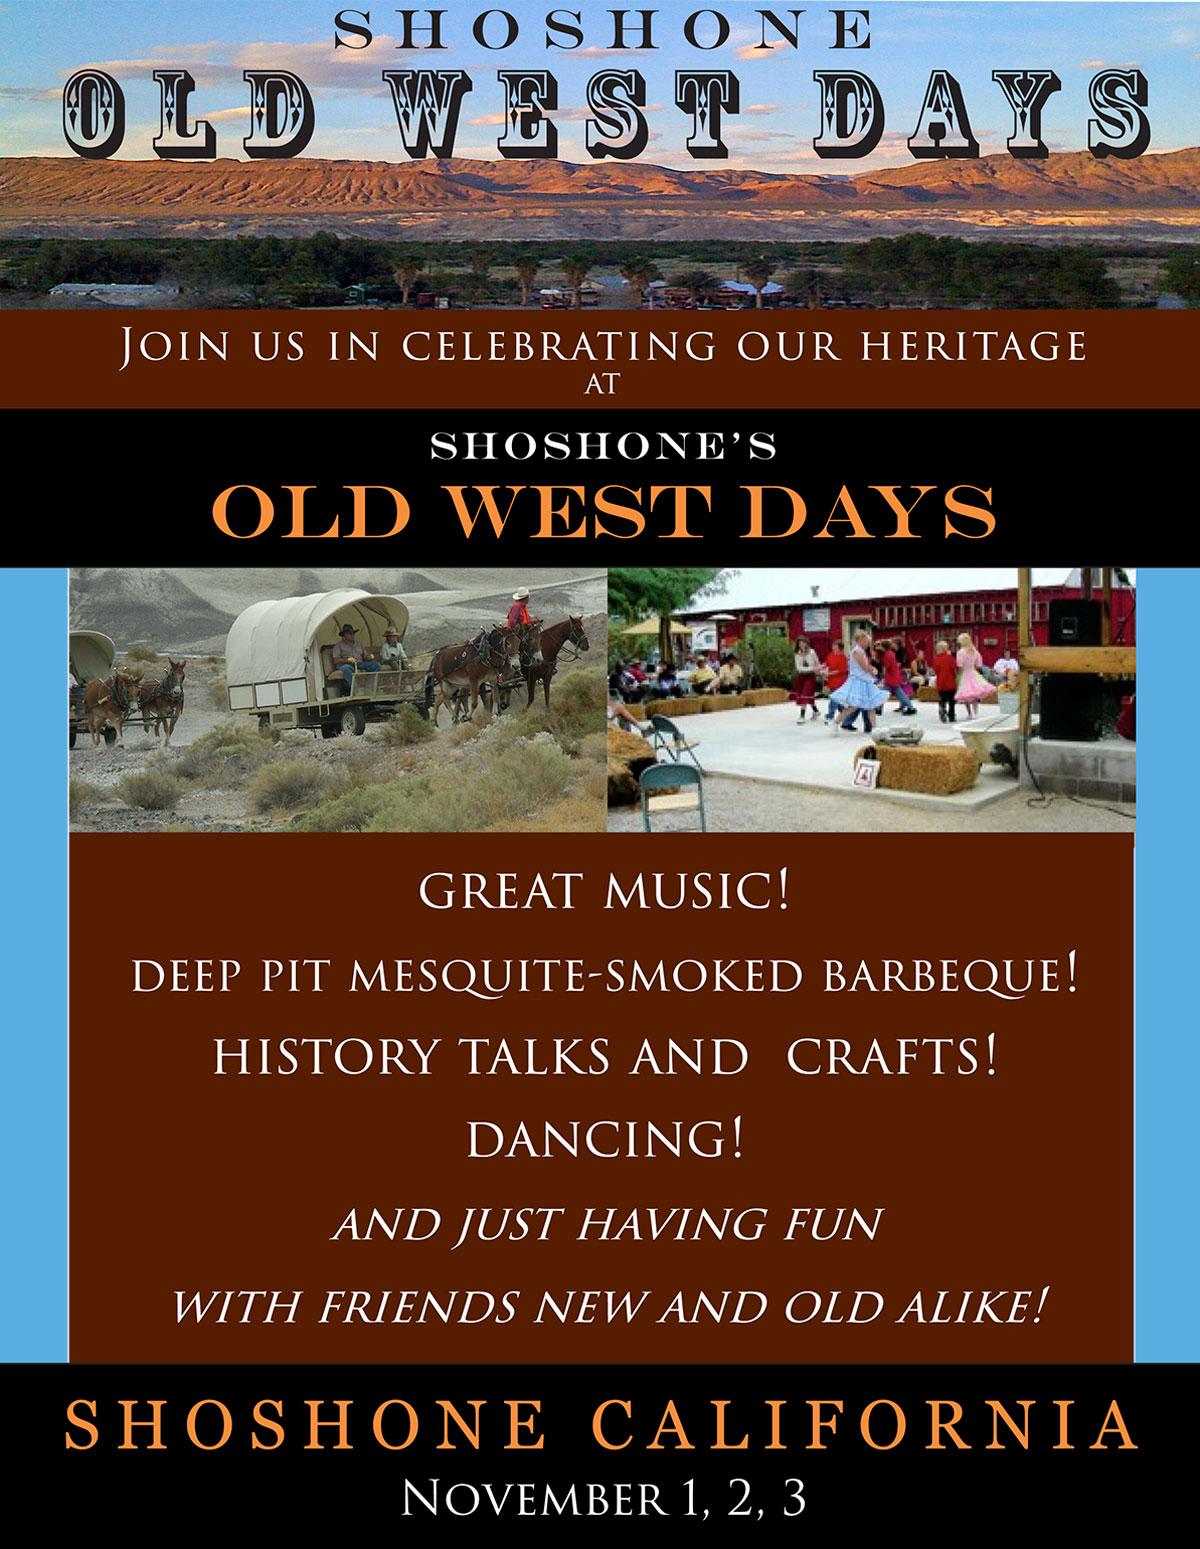 Shoshone Old West Days